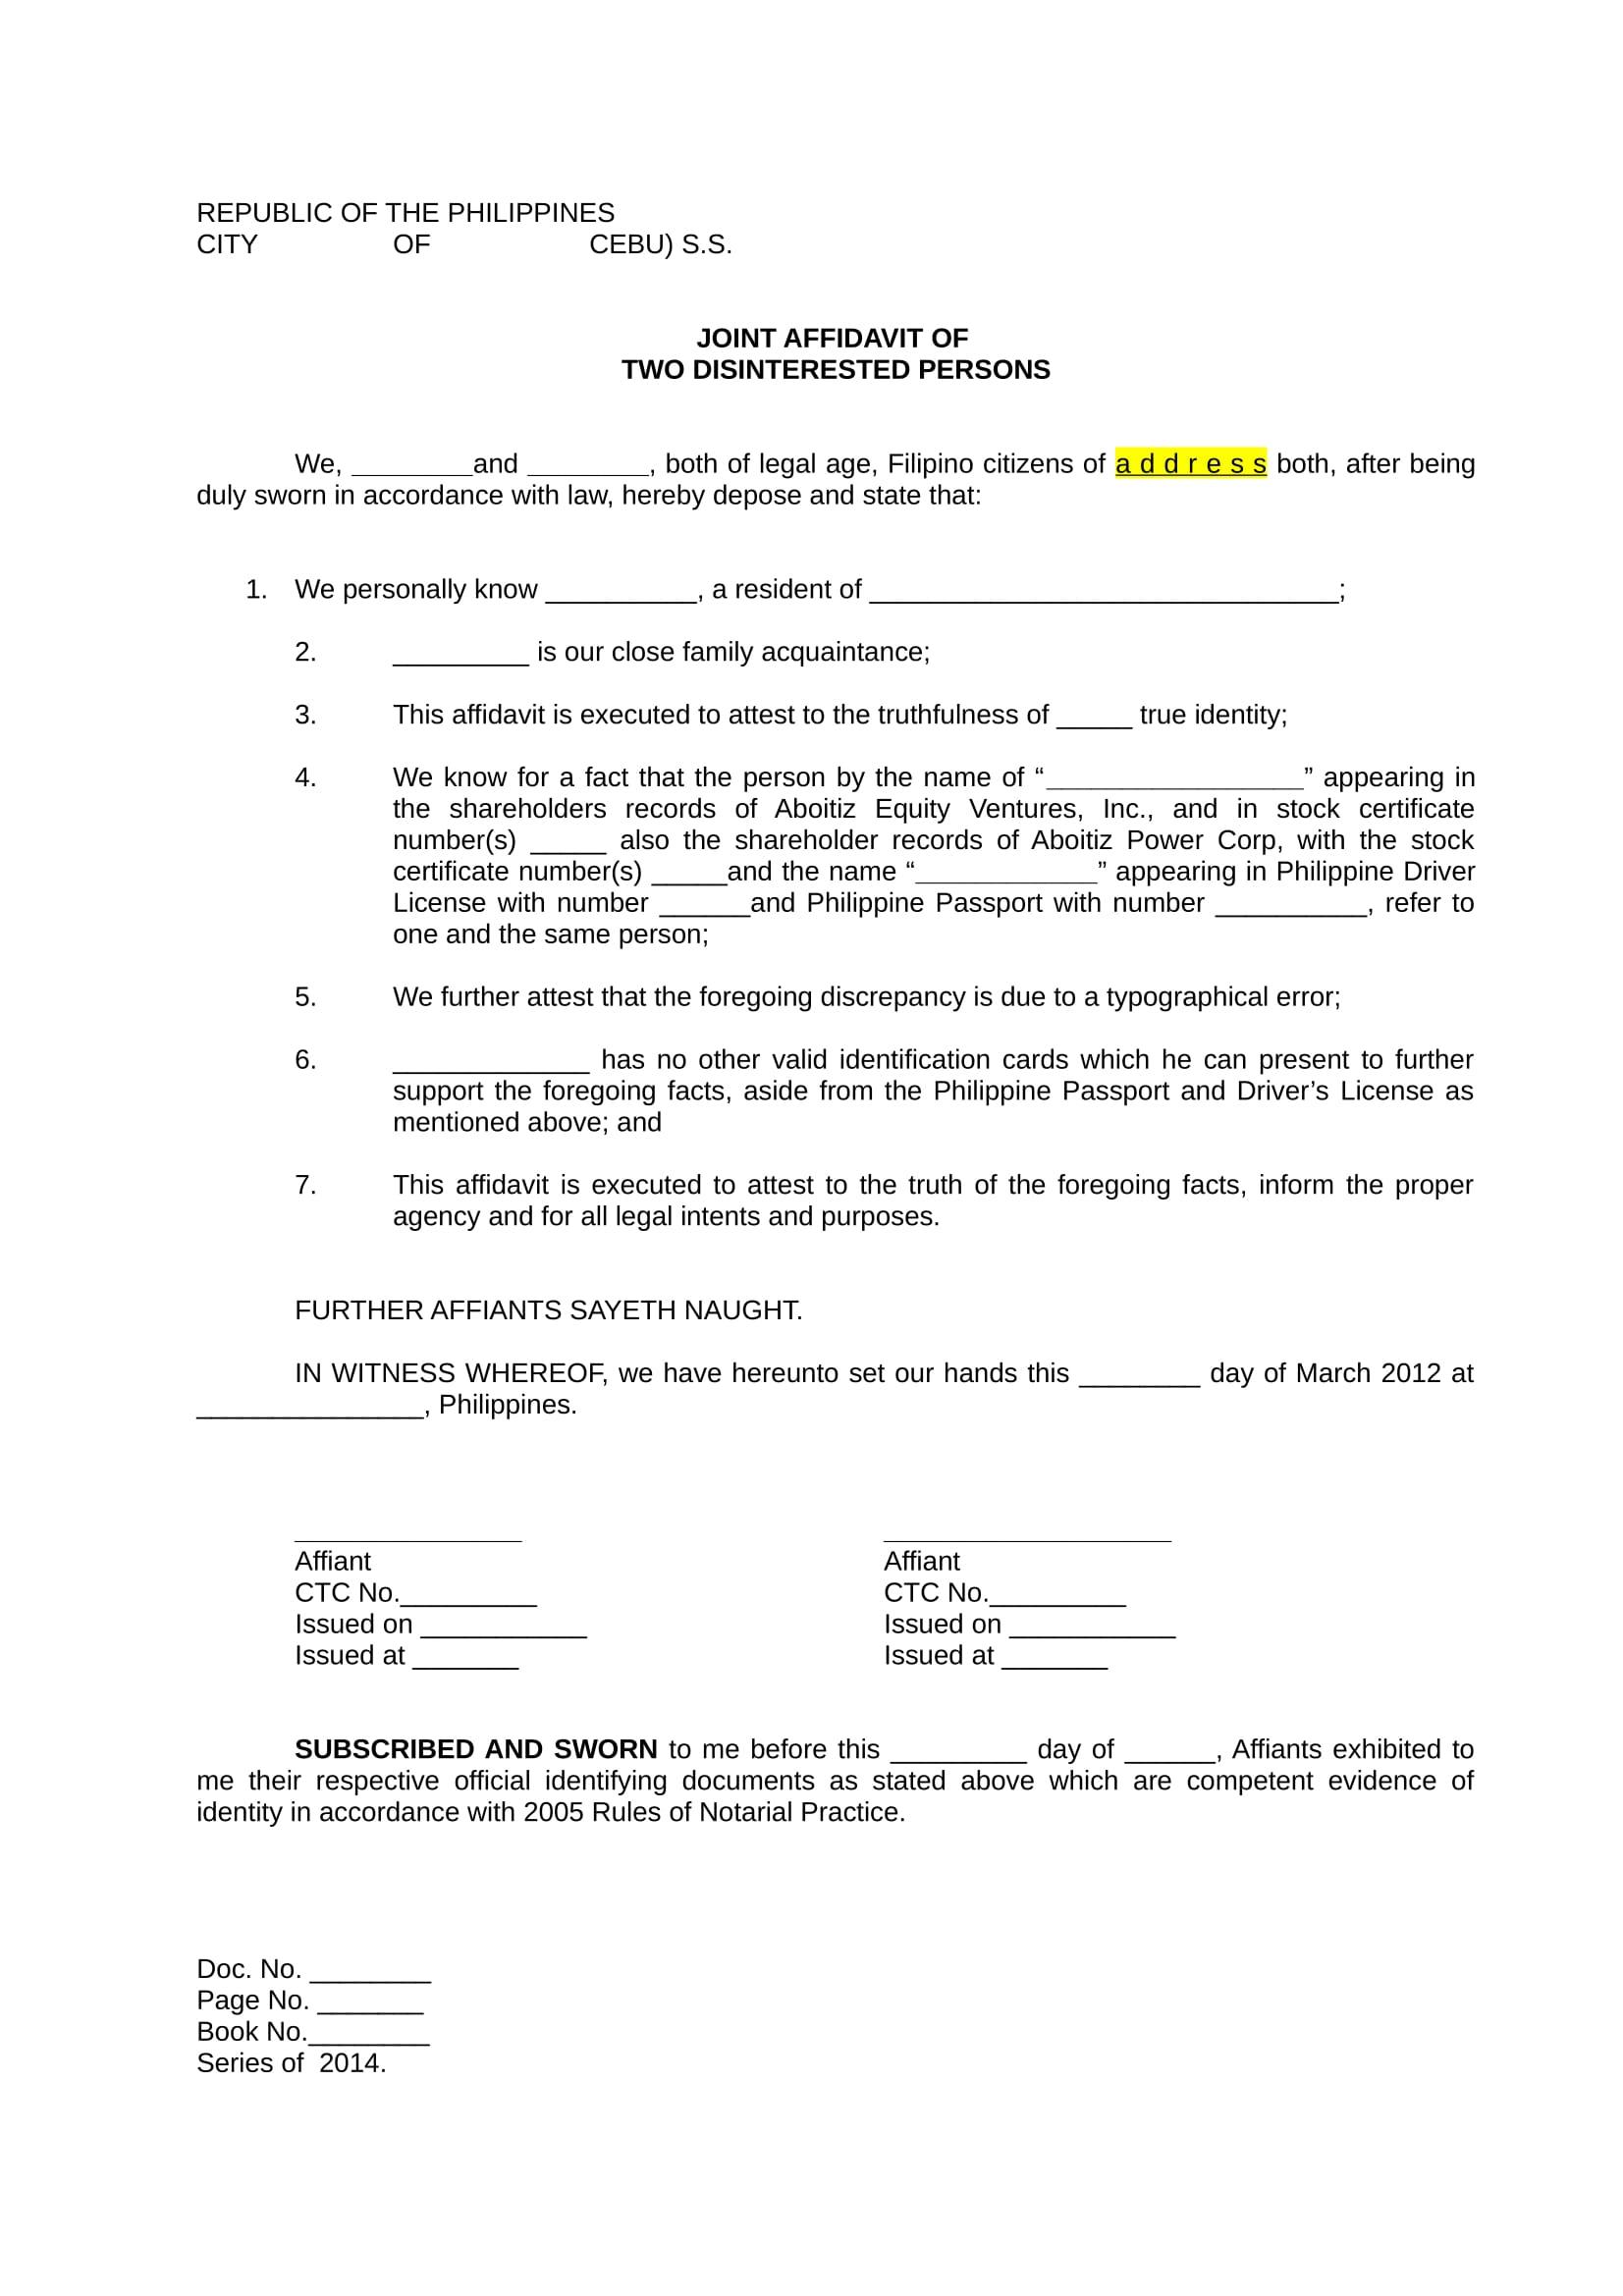 joint affidavit form sample 1